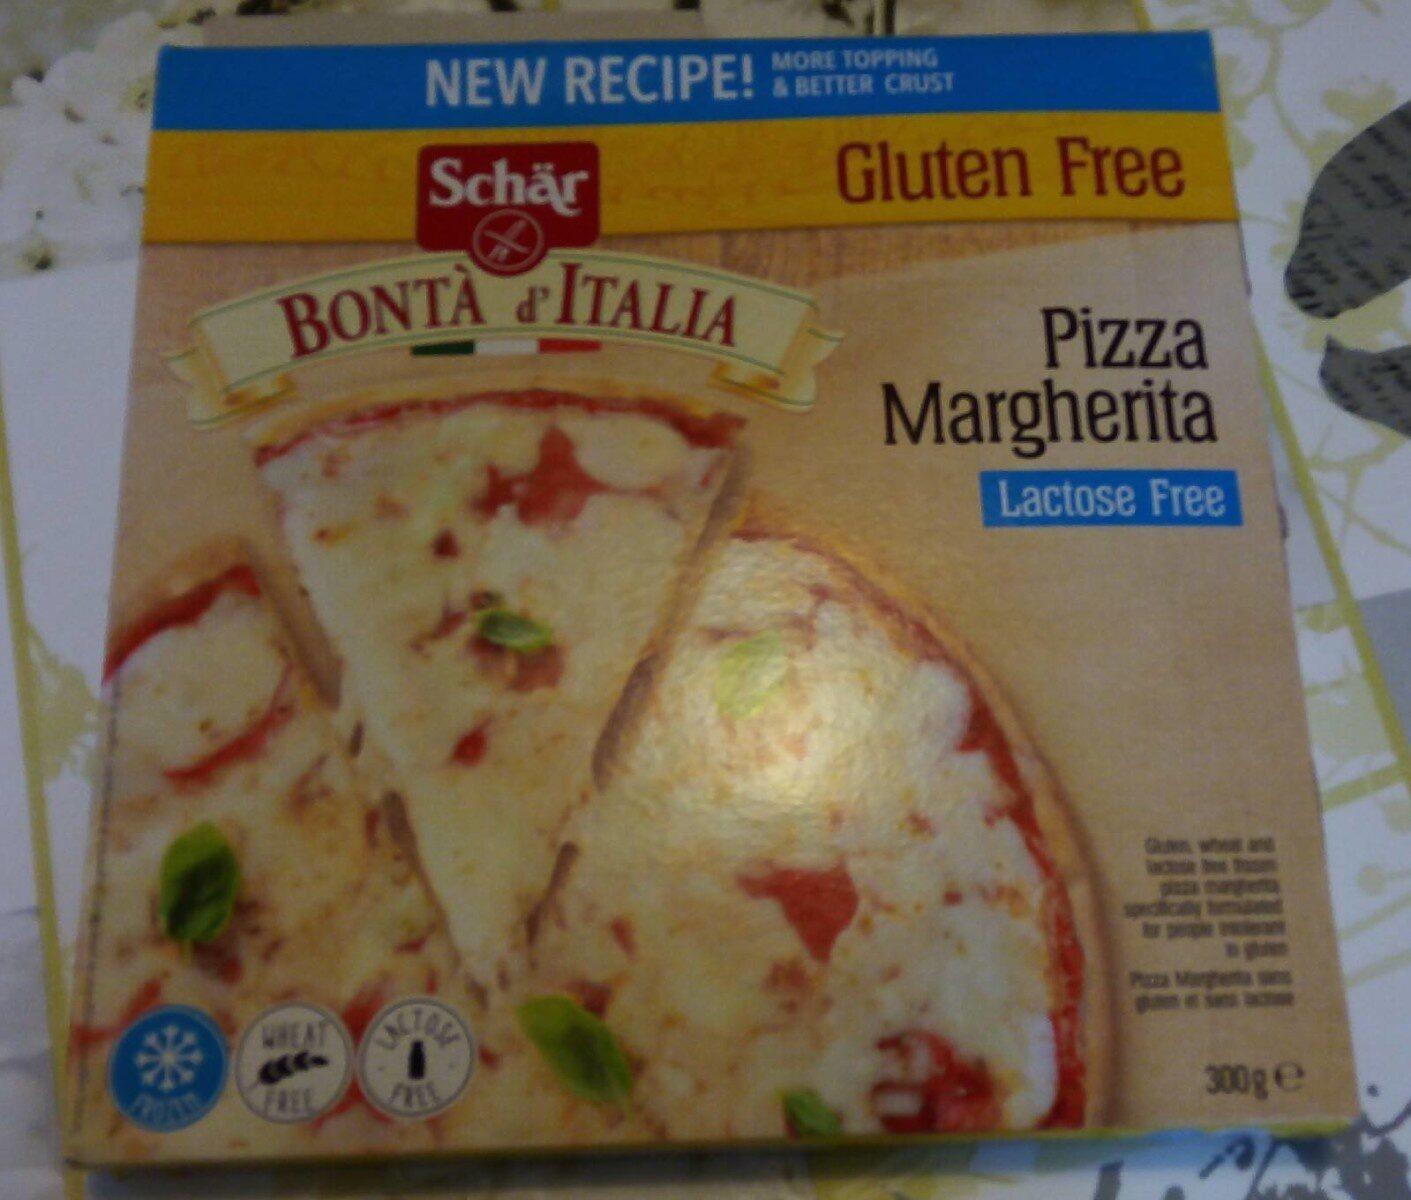 Pizza Margherita sans gluten - Product - fr